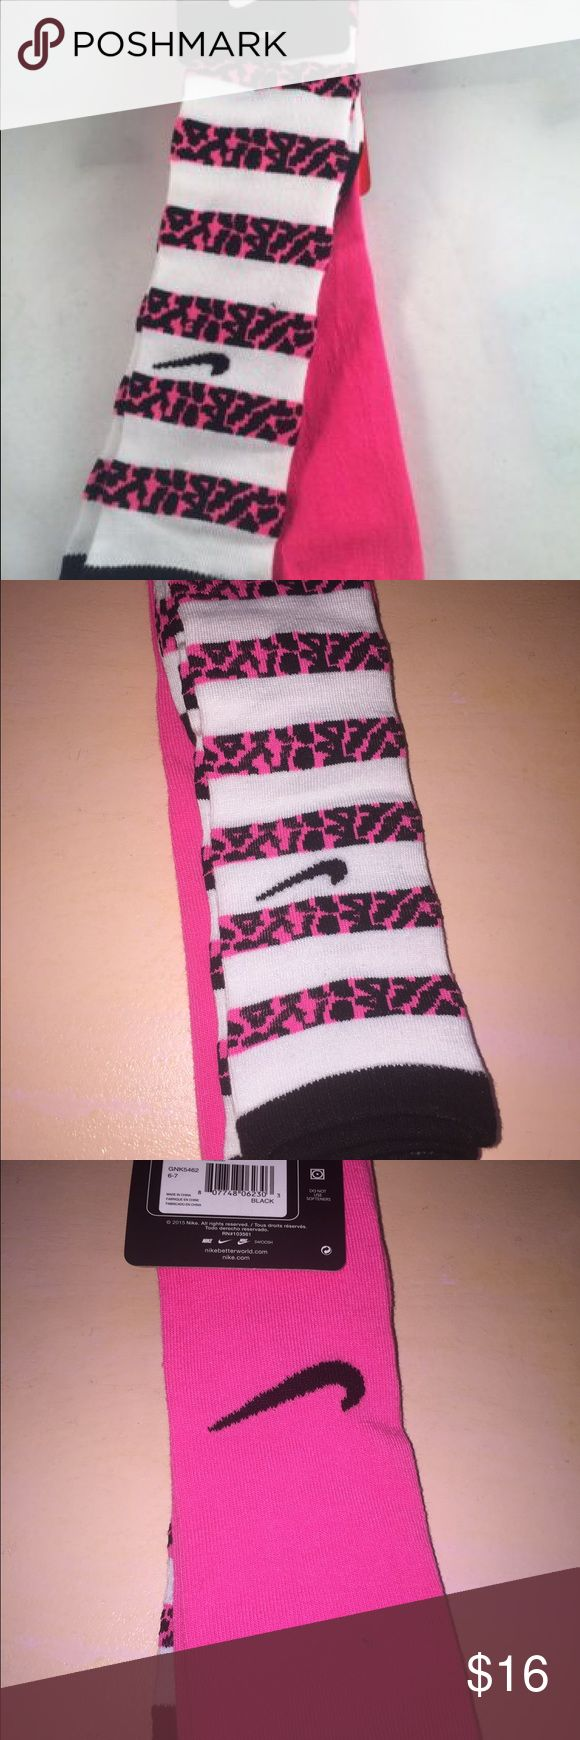 NIKE KNEE HIGH SOCKS BUY ANY 5 GET 50% OFF Cool Nike socks. 2 pair. Size 13c to 3y Nike Accessories Socks & Tights